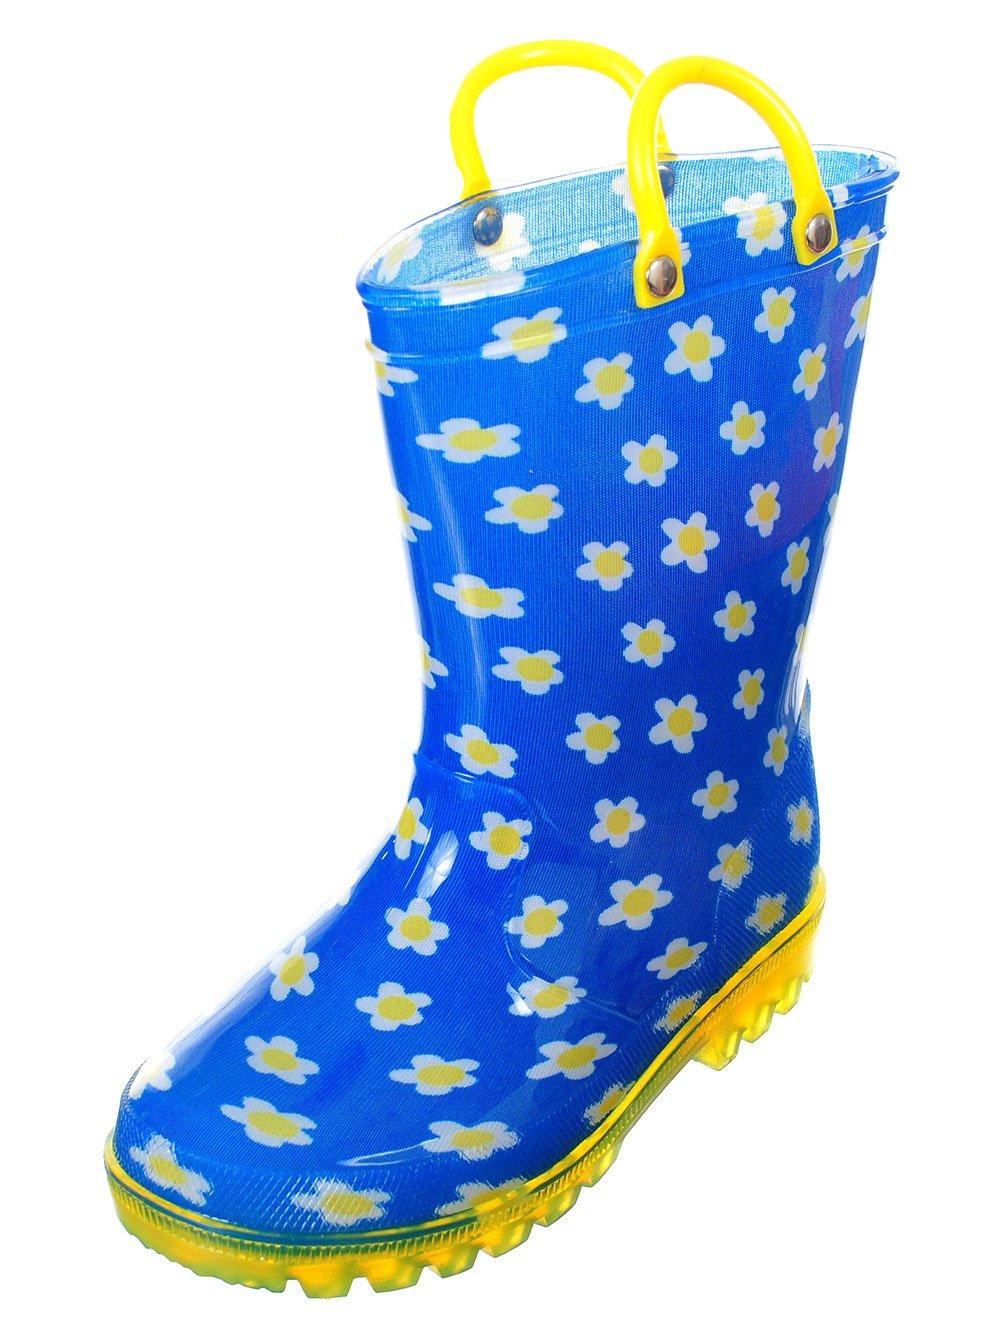 lilly Girls' Light-up Rubber Rain Boots - Blue, 12 Toddler